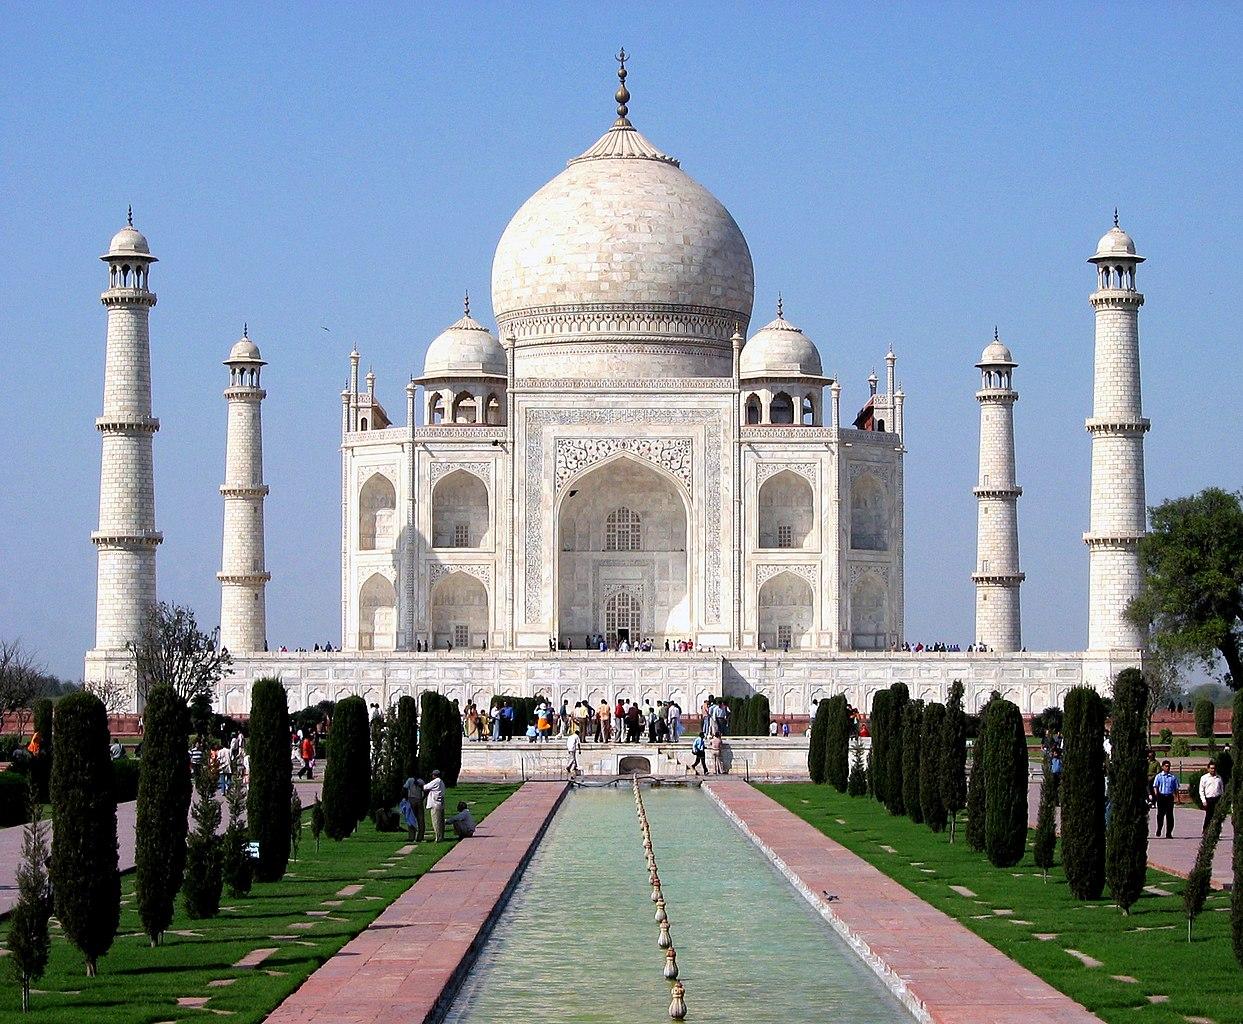 File:Taj Mahal in March 2004.jpg - Wikipedia